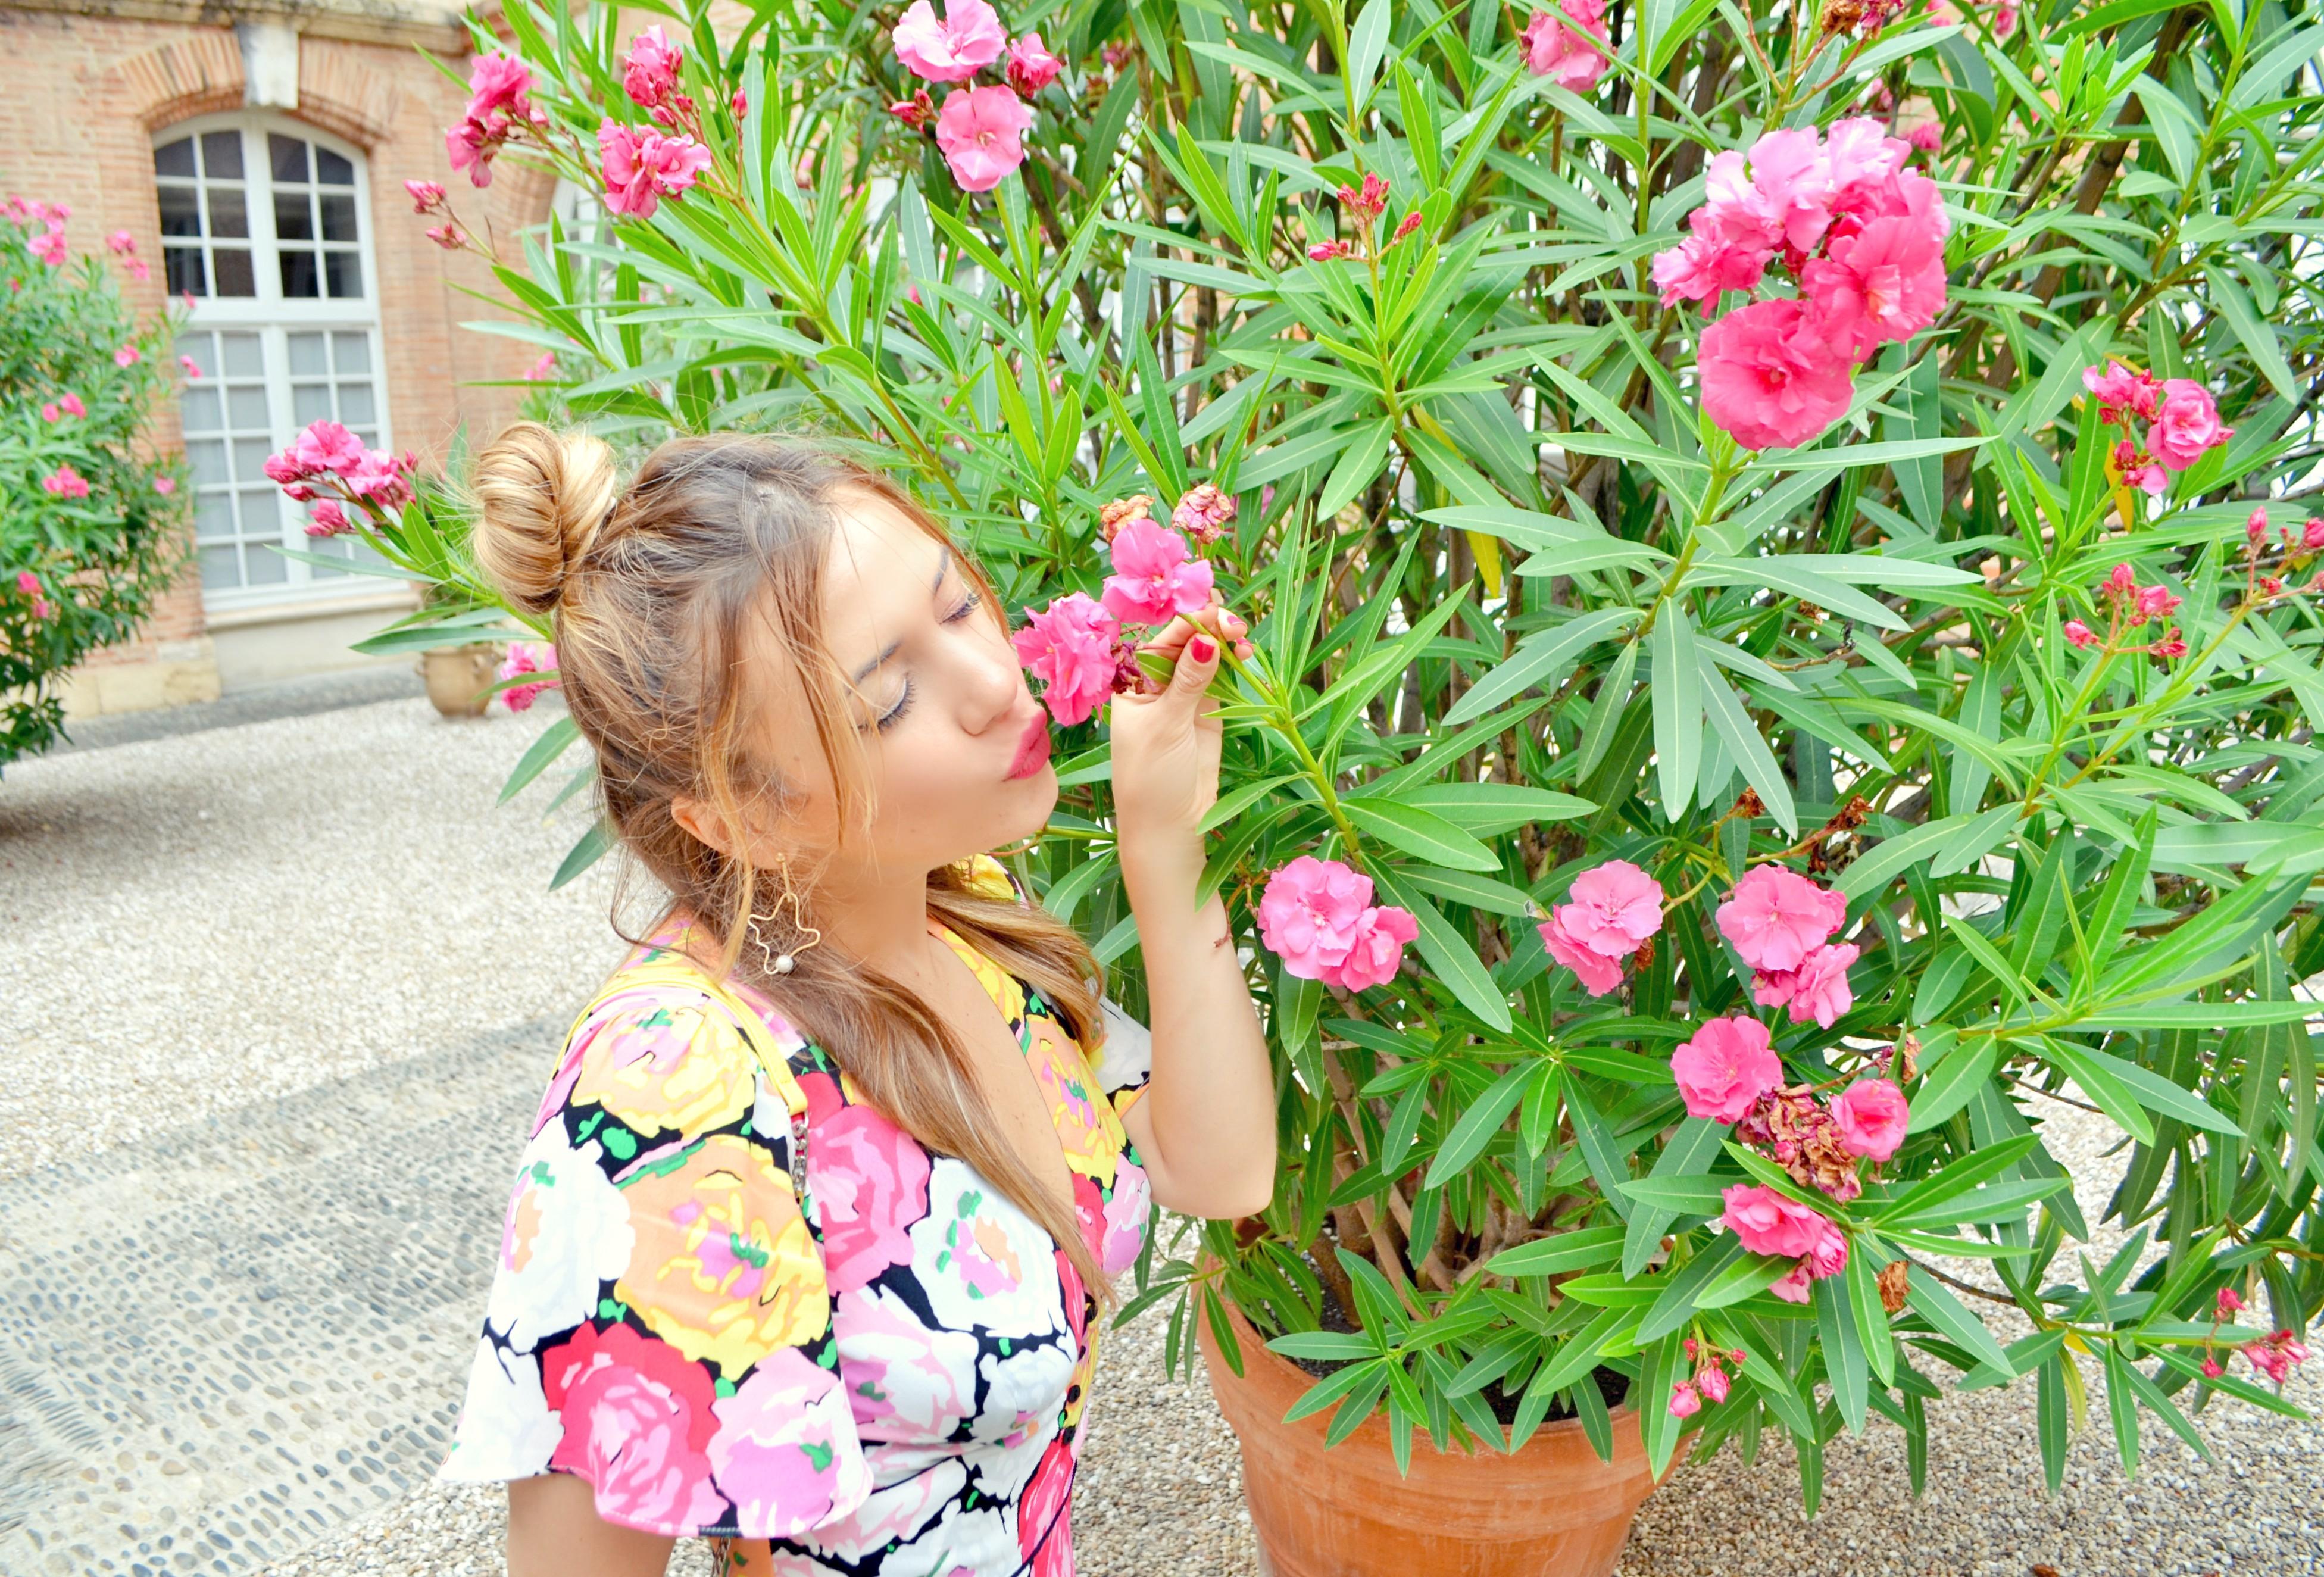 Vestido-de-flores-Zara-ChicAdicta-influencer-Chic-Adicta-flowers-look-travel-blogger-Toulouse-trip-Monki-accessories-PiensaenChic-Piensa-en-Chic